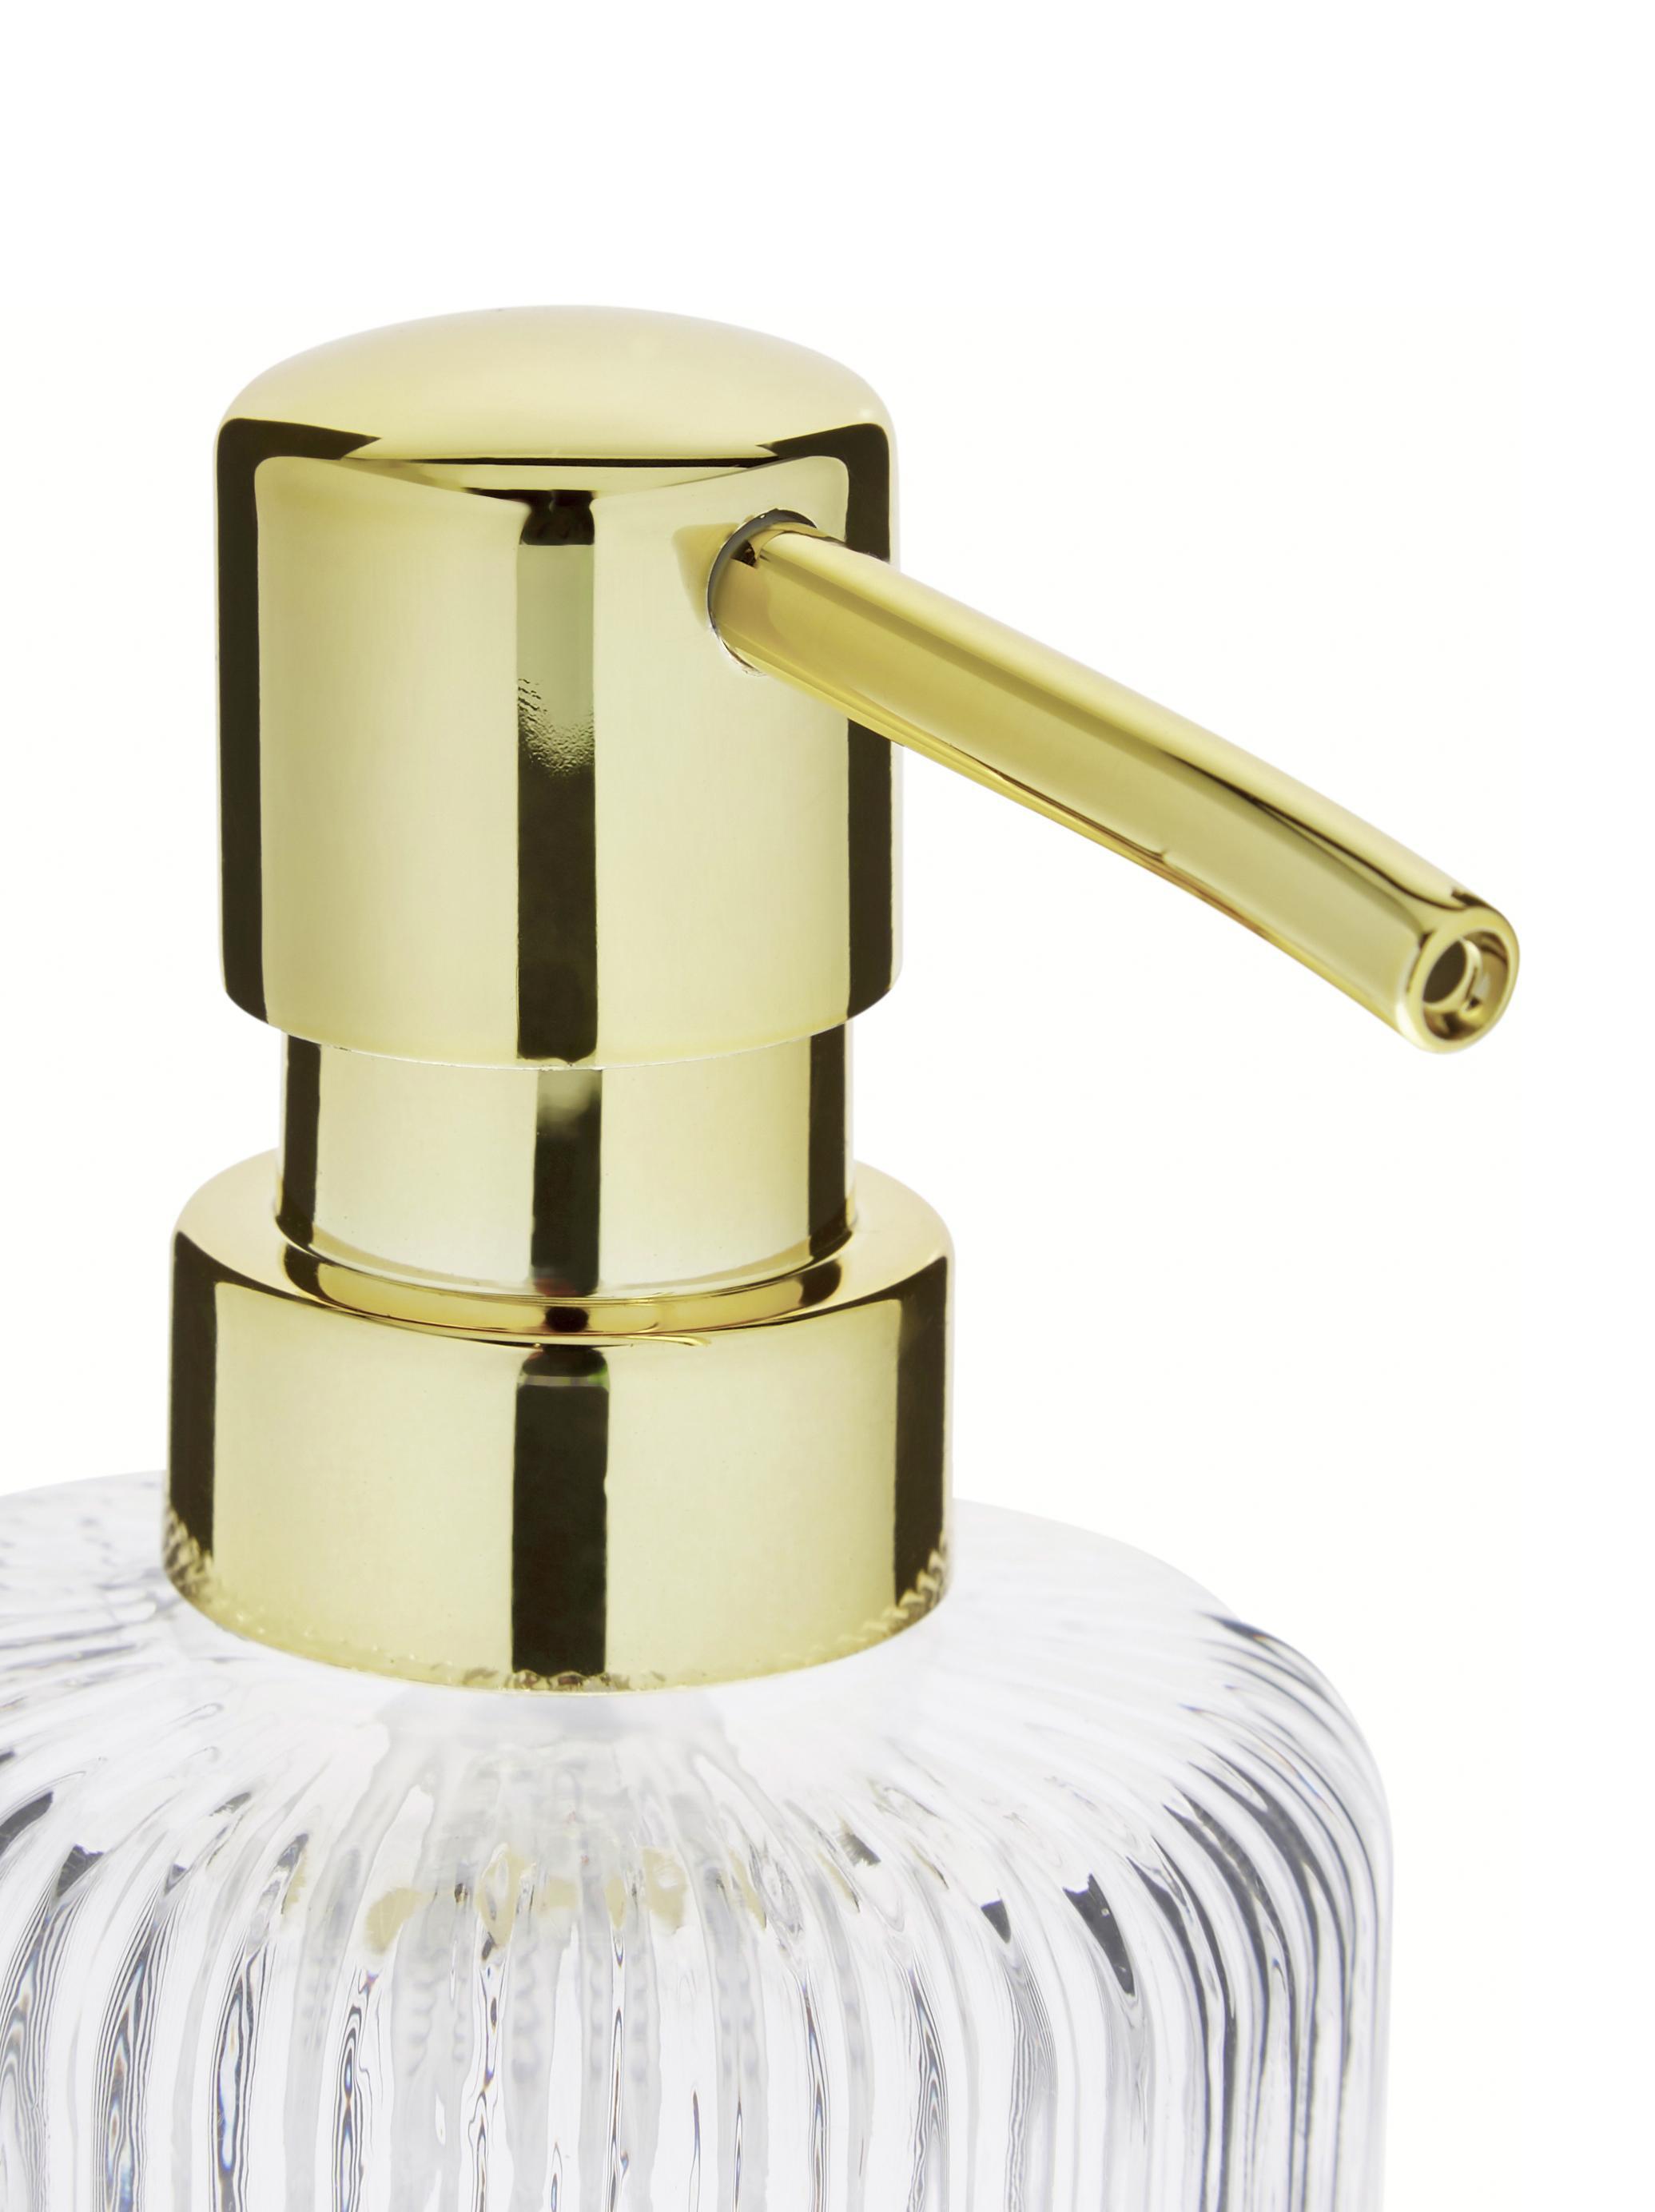 Glas-Seifenspender Gulji, Behälter: Glas, Pumpkopf: Kunststoff, Transparent, Goldfarben, Ø 7 x H 17 cm